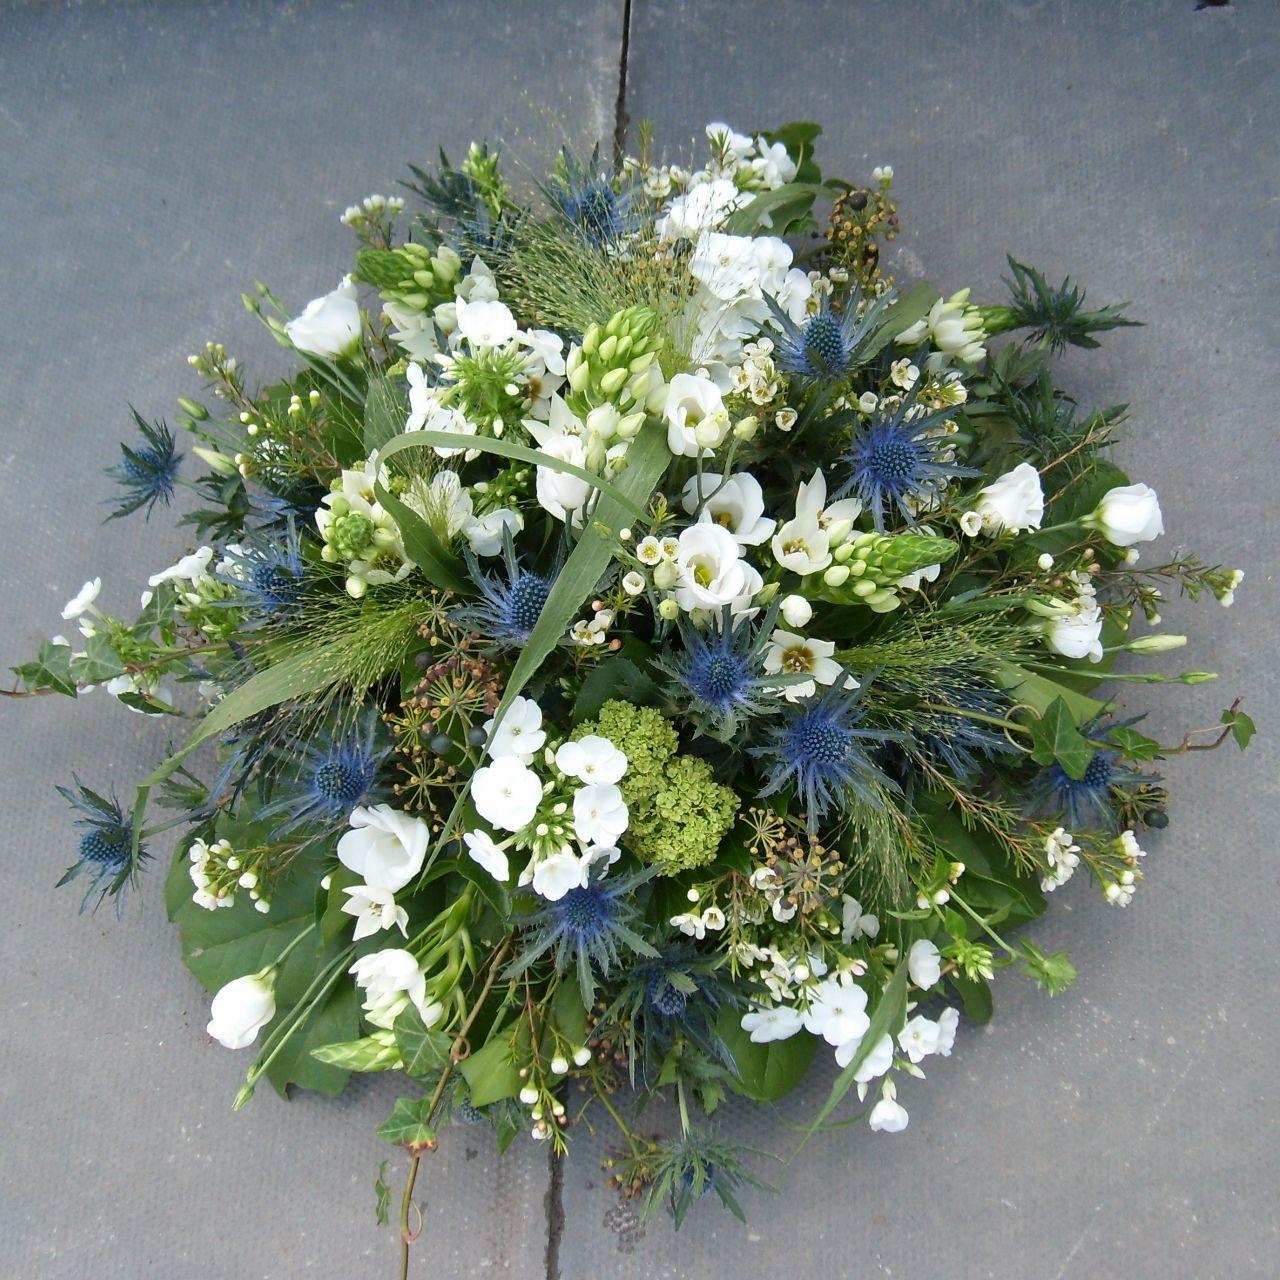 Sympathy celebration of life pinterest funeral flowers sympathy wreath ringsfuneral spraysmemorial flowersfuneral dhlflorist Images